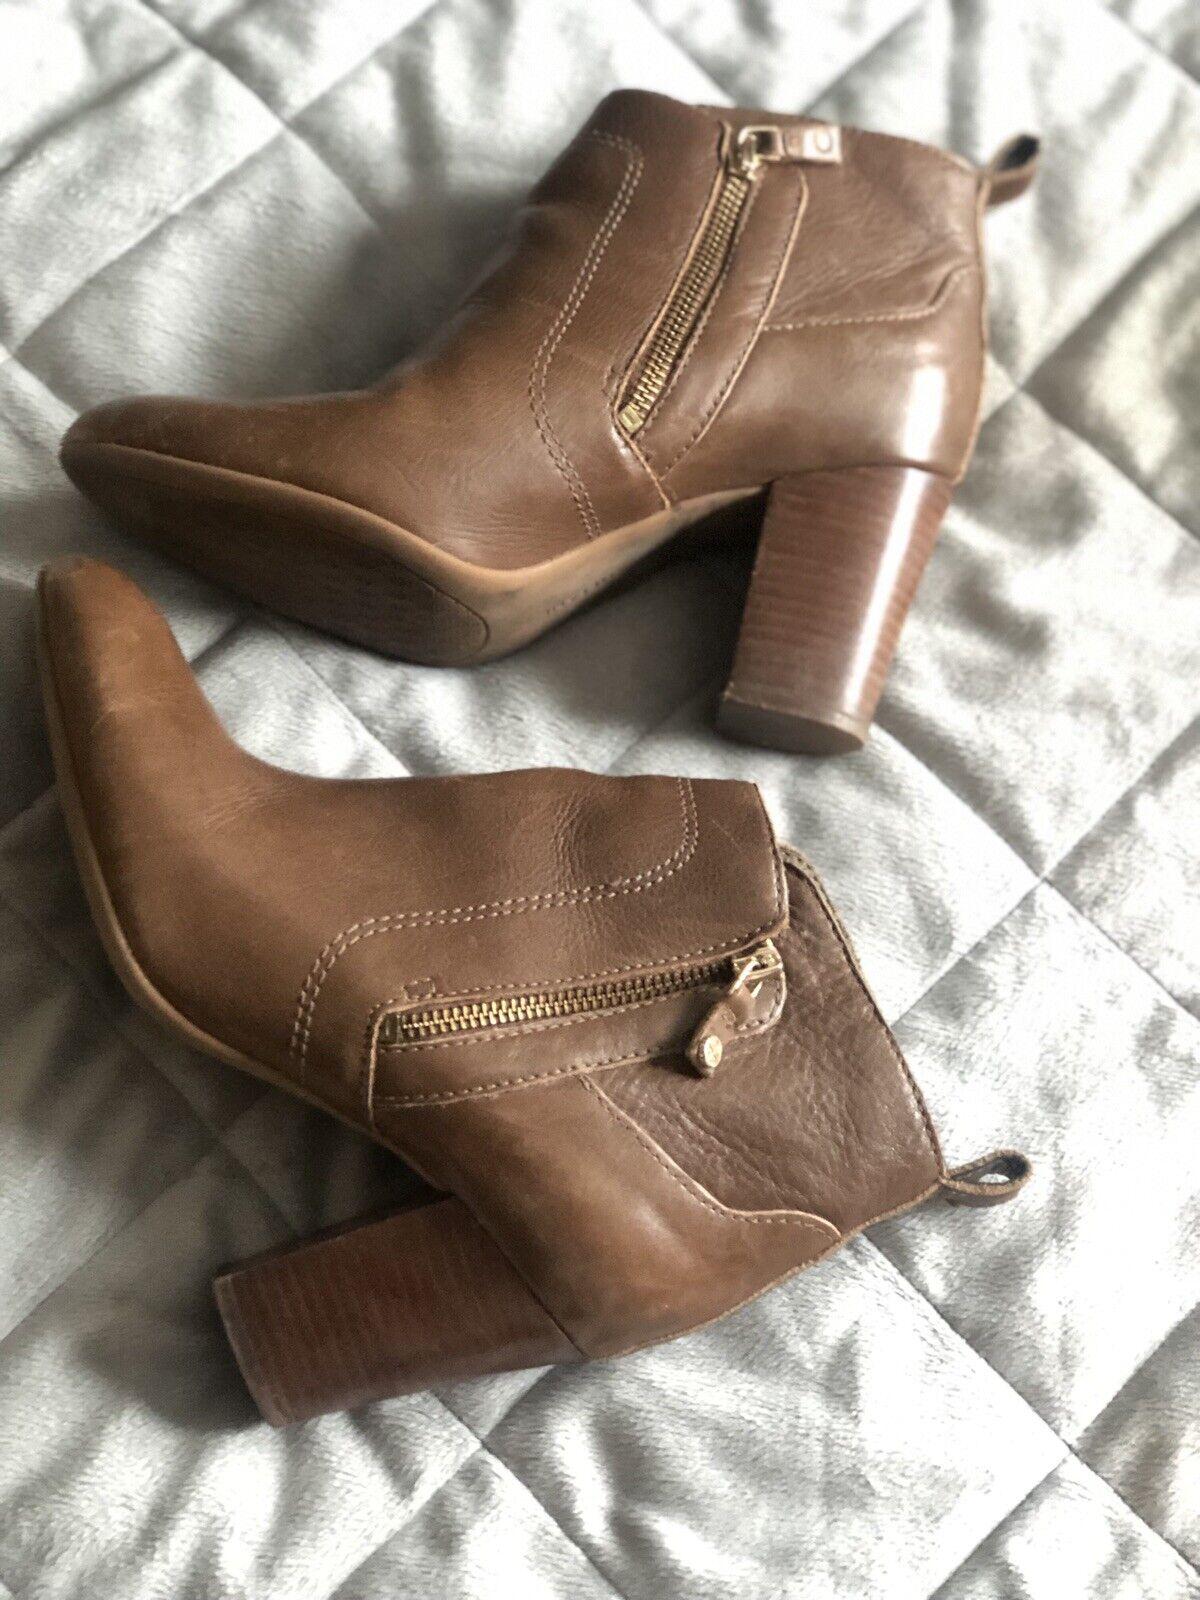 Antonio Melani Womens Ankle Boots Size 7.5 M